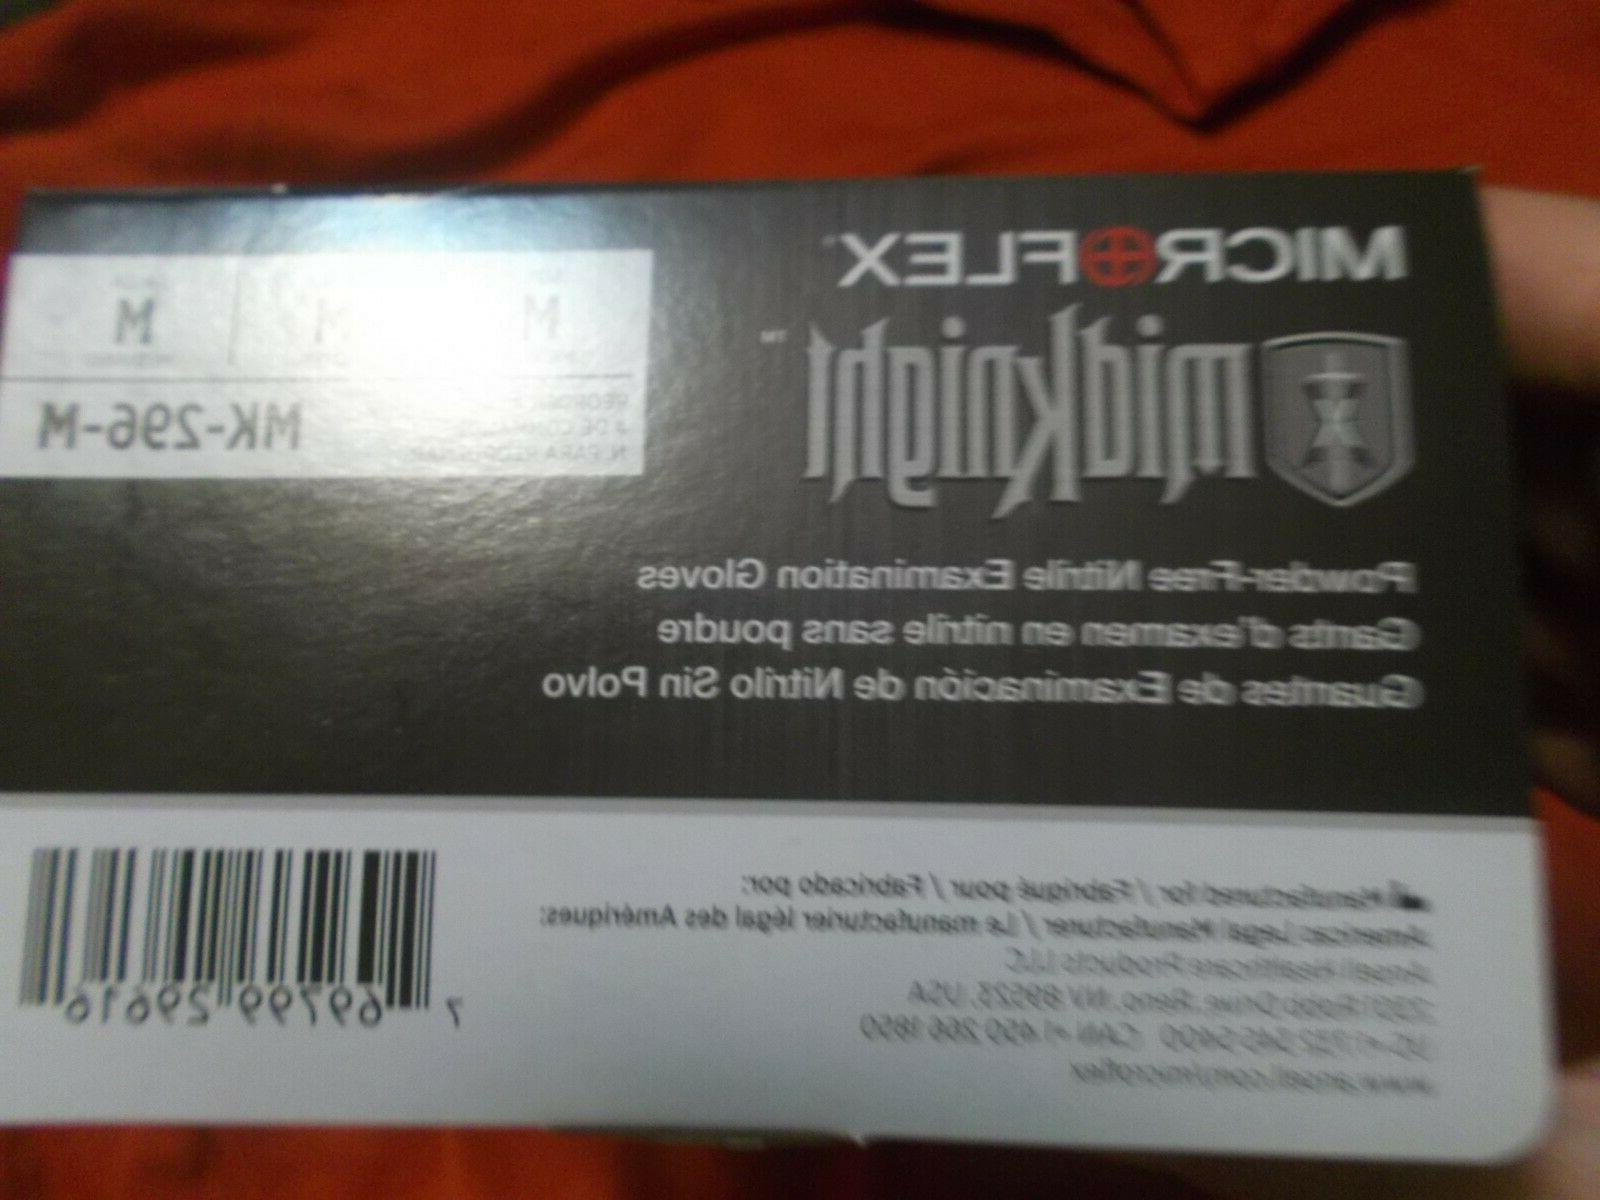 New! 100 Textured Microflex Nitrile Gloves Size M-5.5